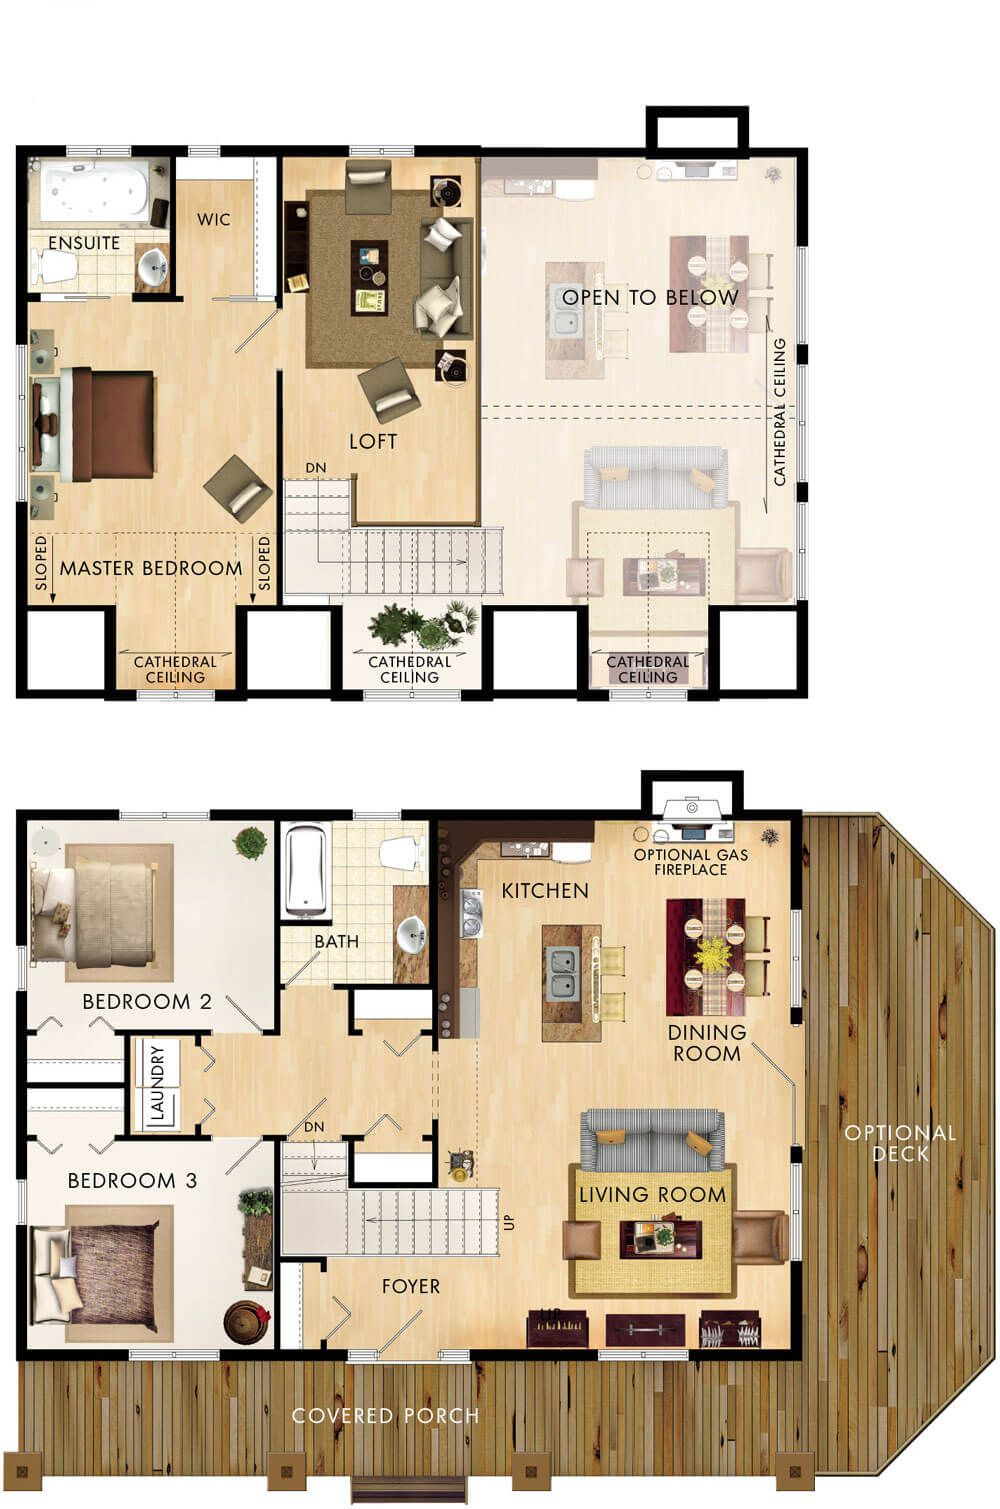 3 bedroom loft house  Gatineau Floor Plan  floor plans  Pinterest  Barn loft House and